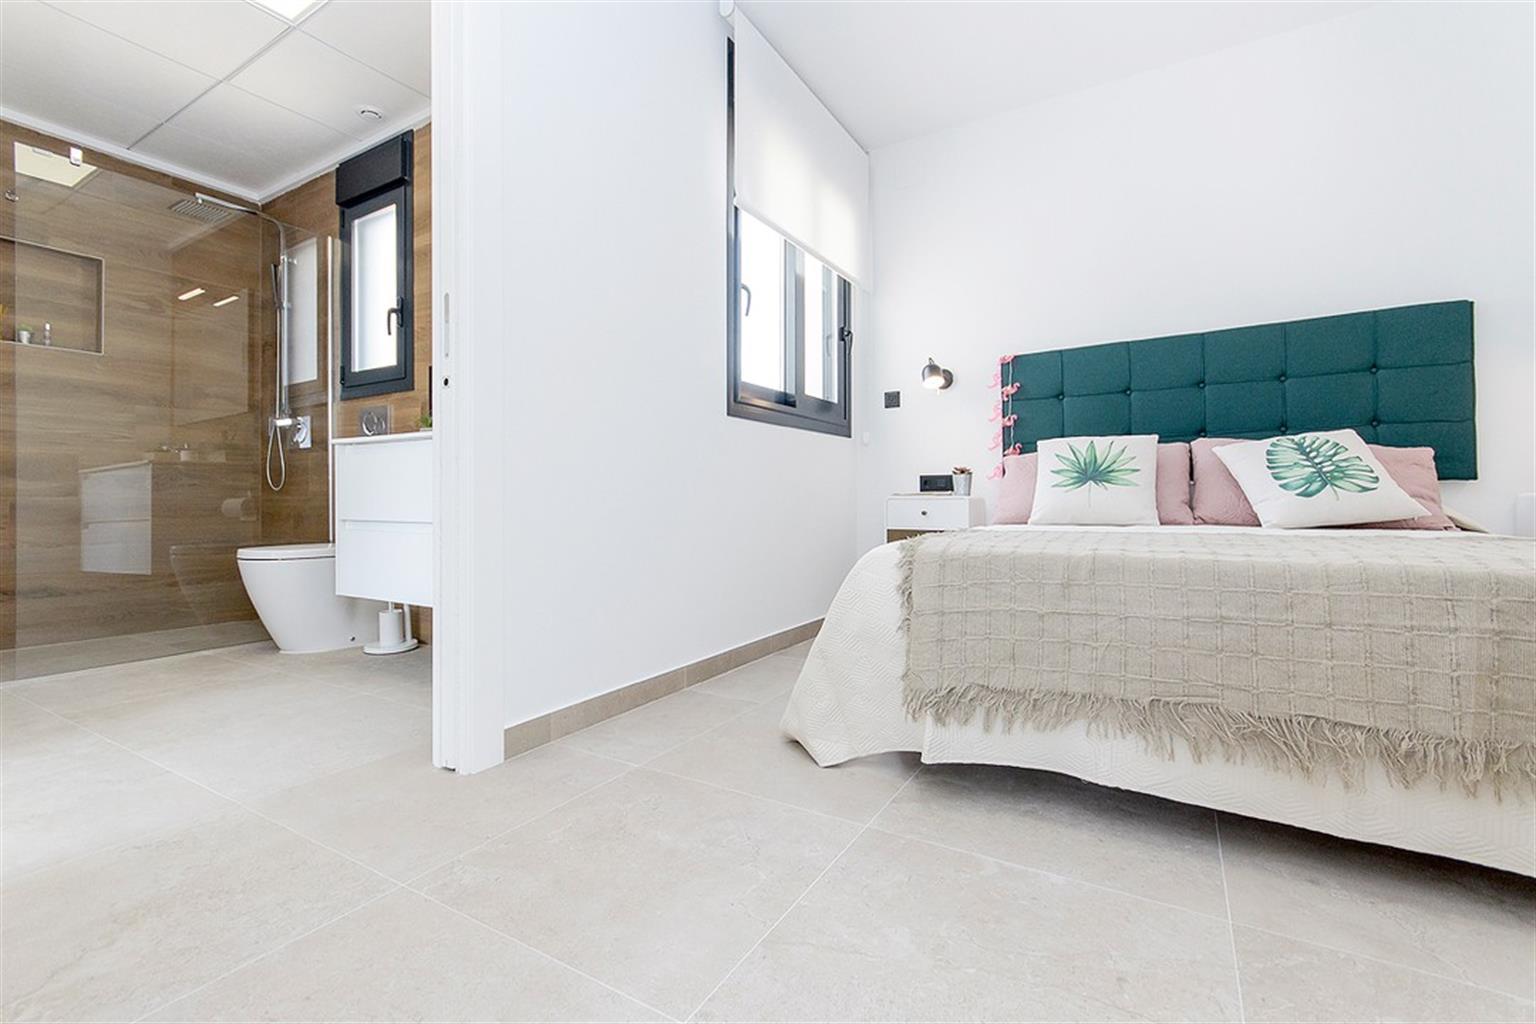 Maison - Benijofar  - #4231530-43